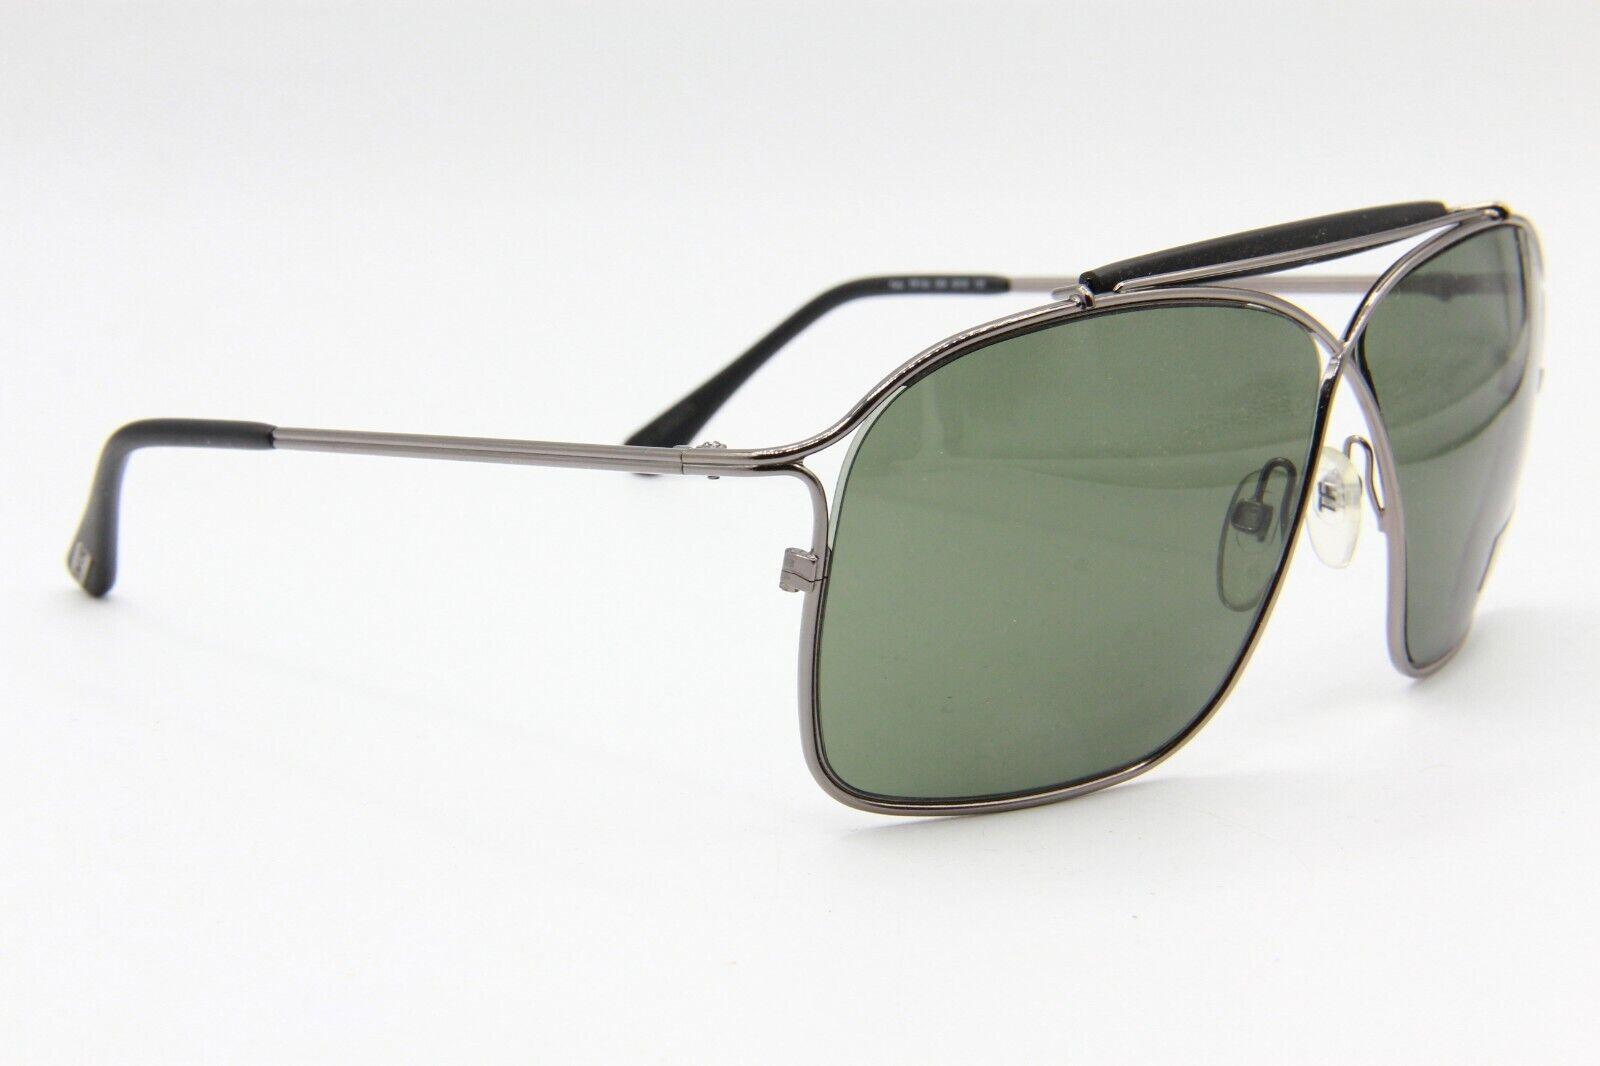 b3660df5d5d0 Tom Ford Sunglasses Tf194 Felix 08n Shiny Gunmetal 194 for sale online